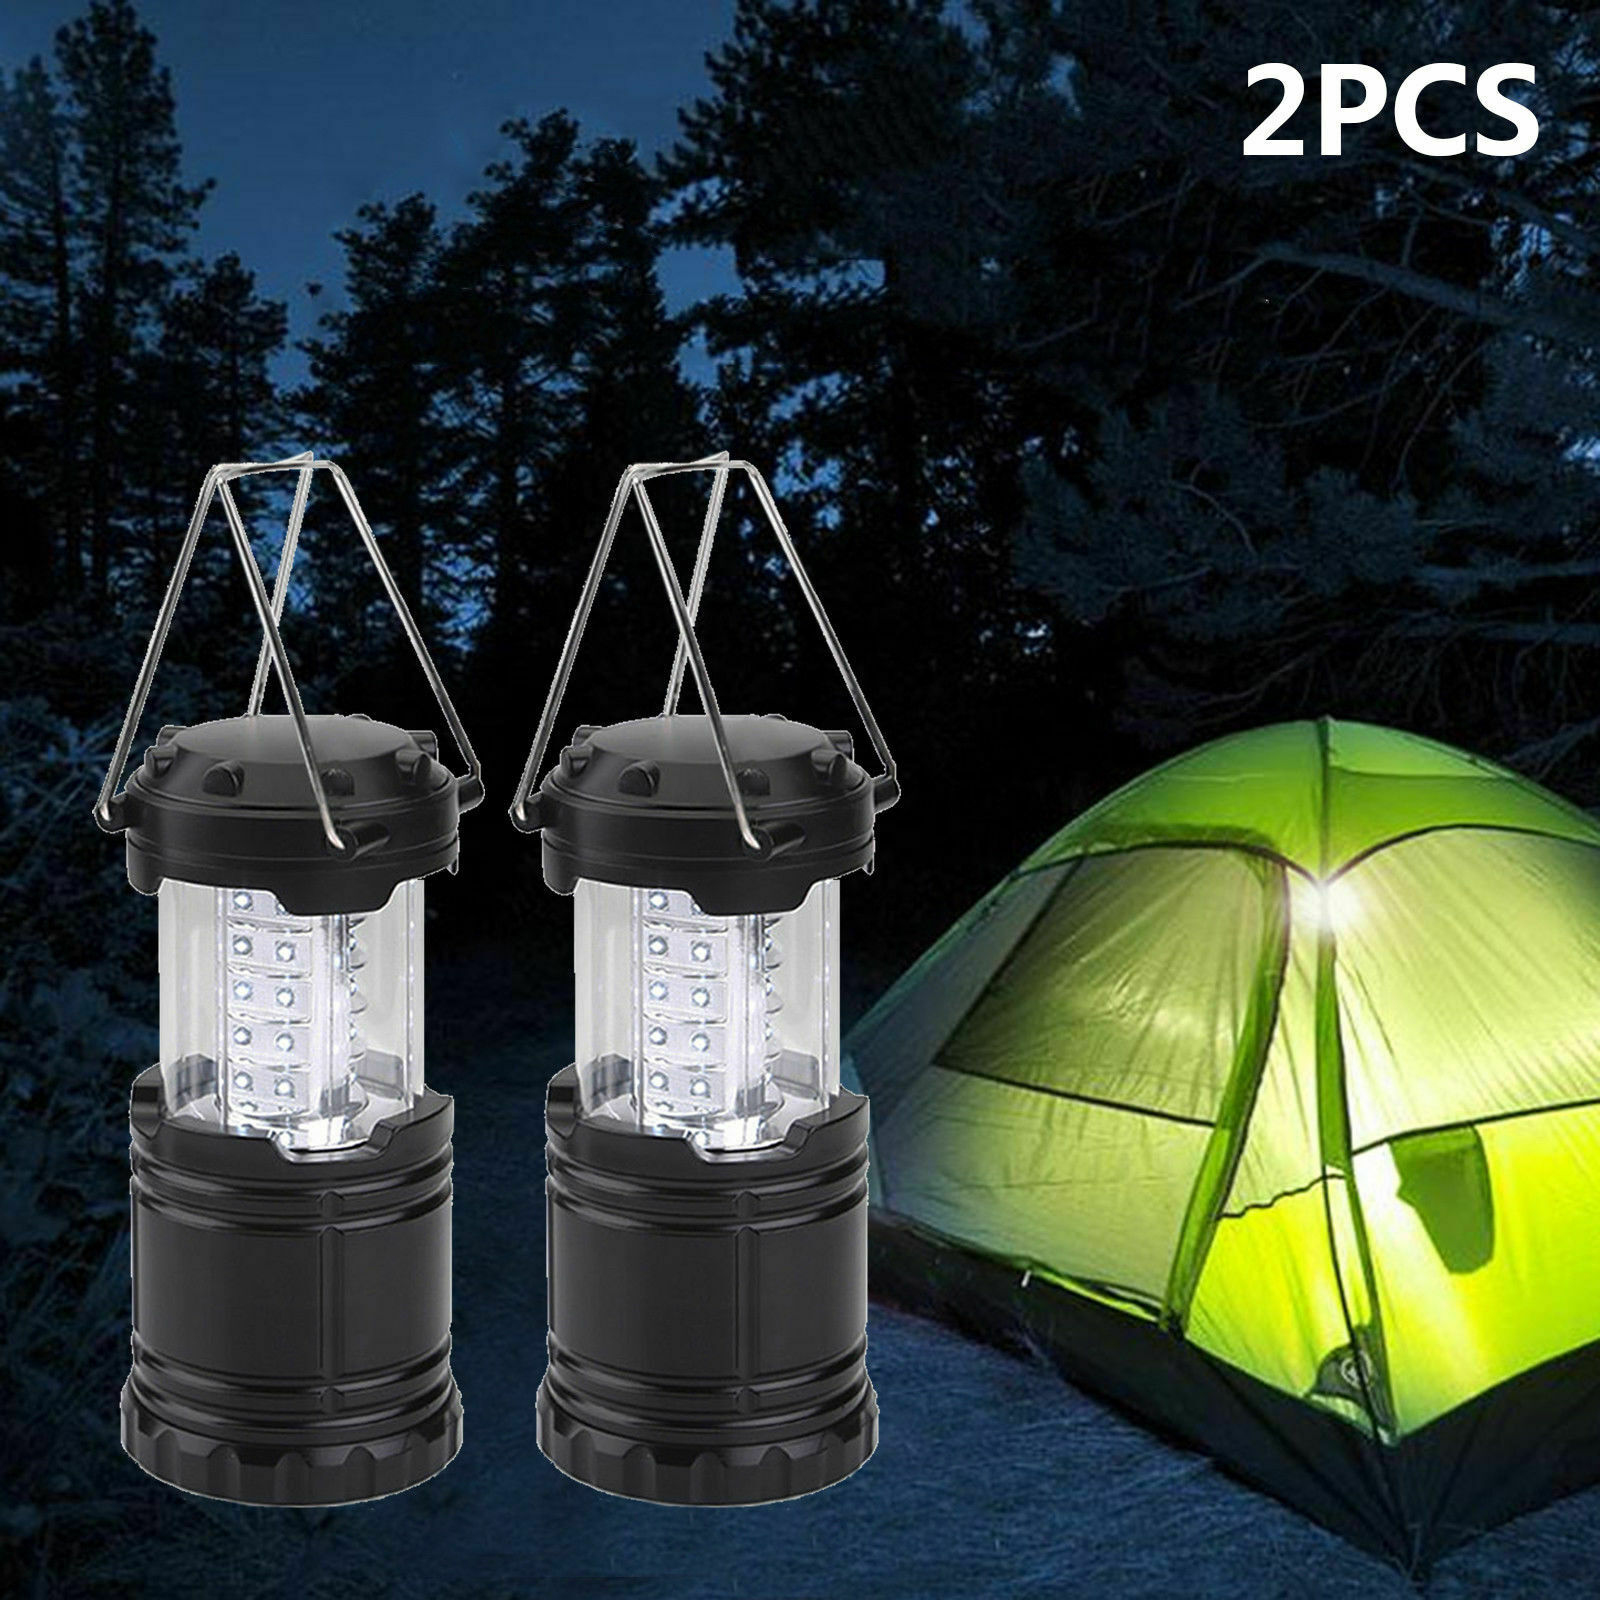 2 pcs carro campista accesseries 30led portatil acampamento tocha bateria operado lanterna luz da noite tenda